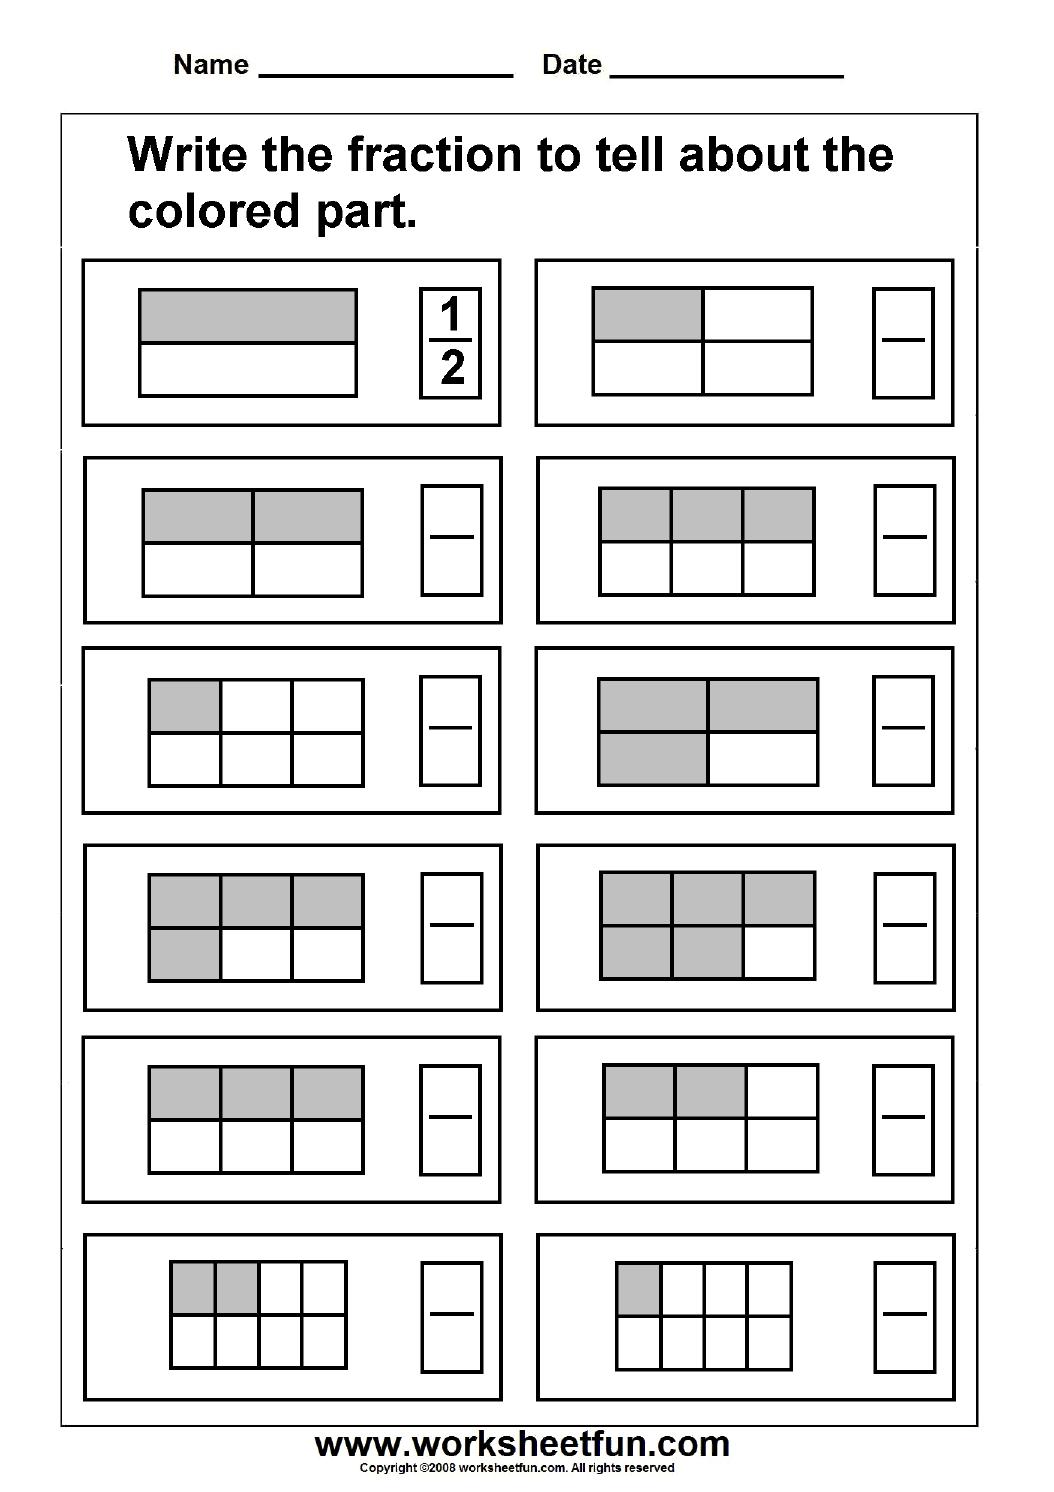 Fraction / Free Printable Worksheets – Worksheetfun - Free Printable Fraction Worksheets